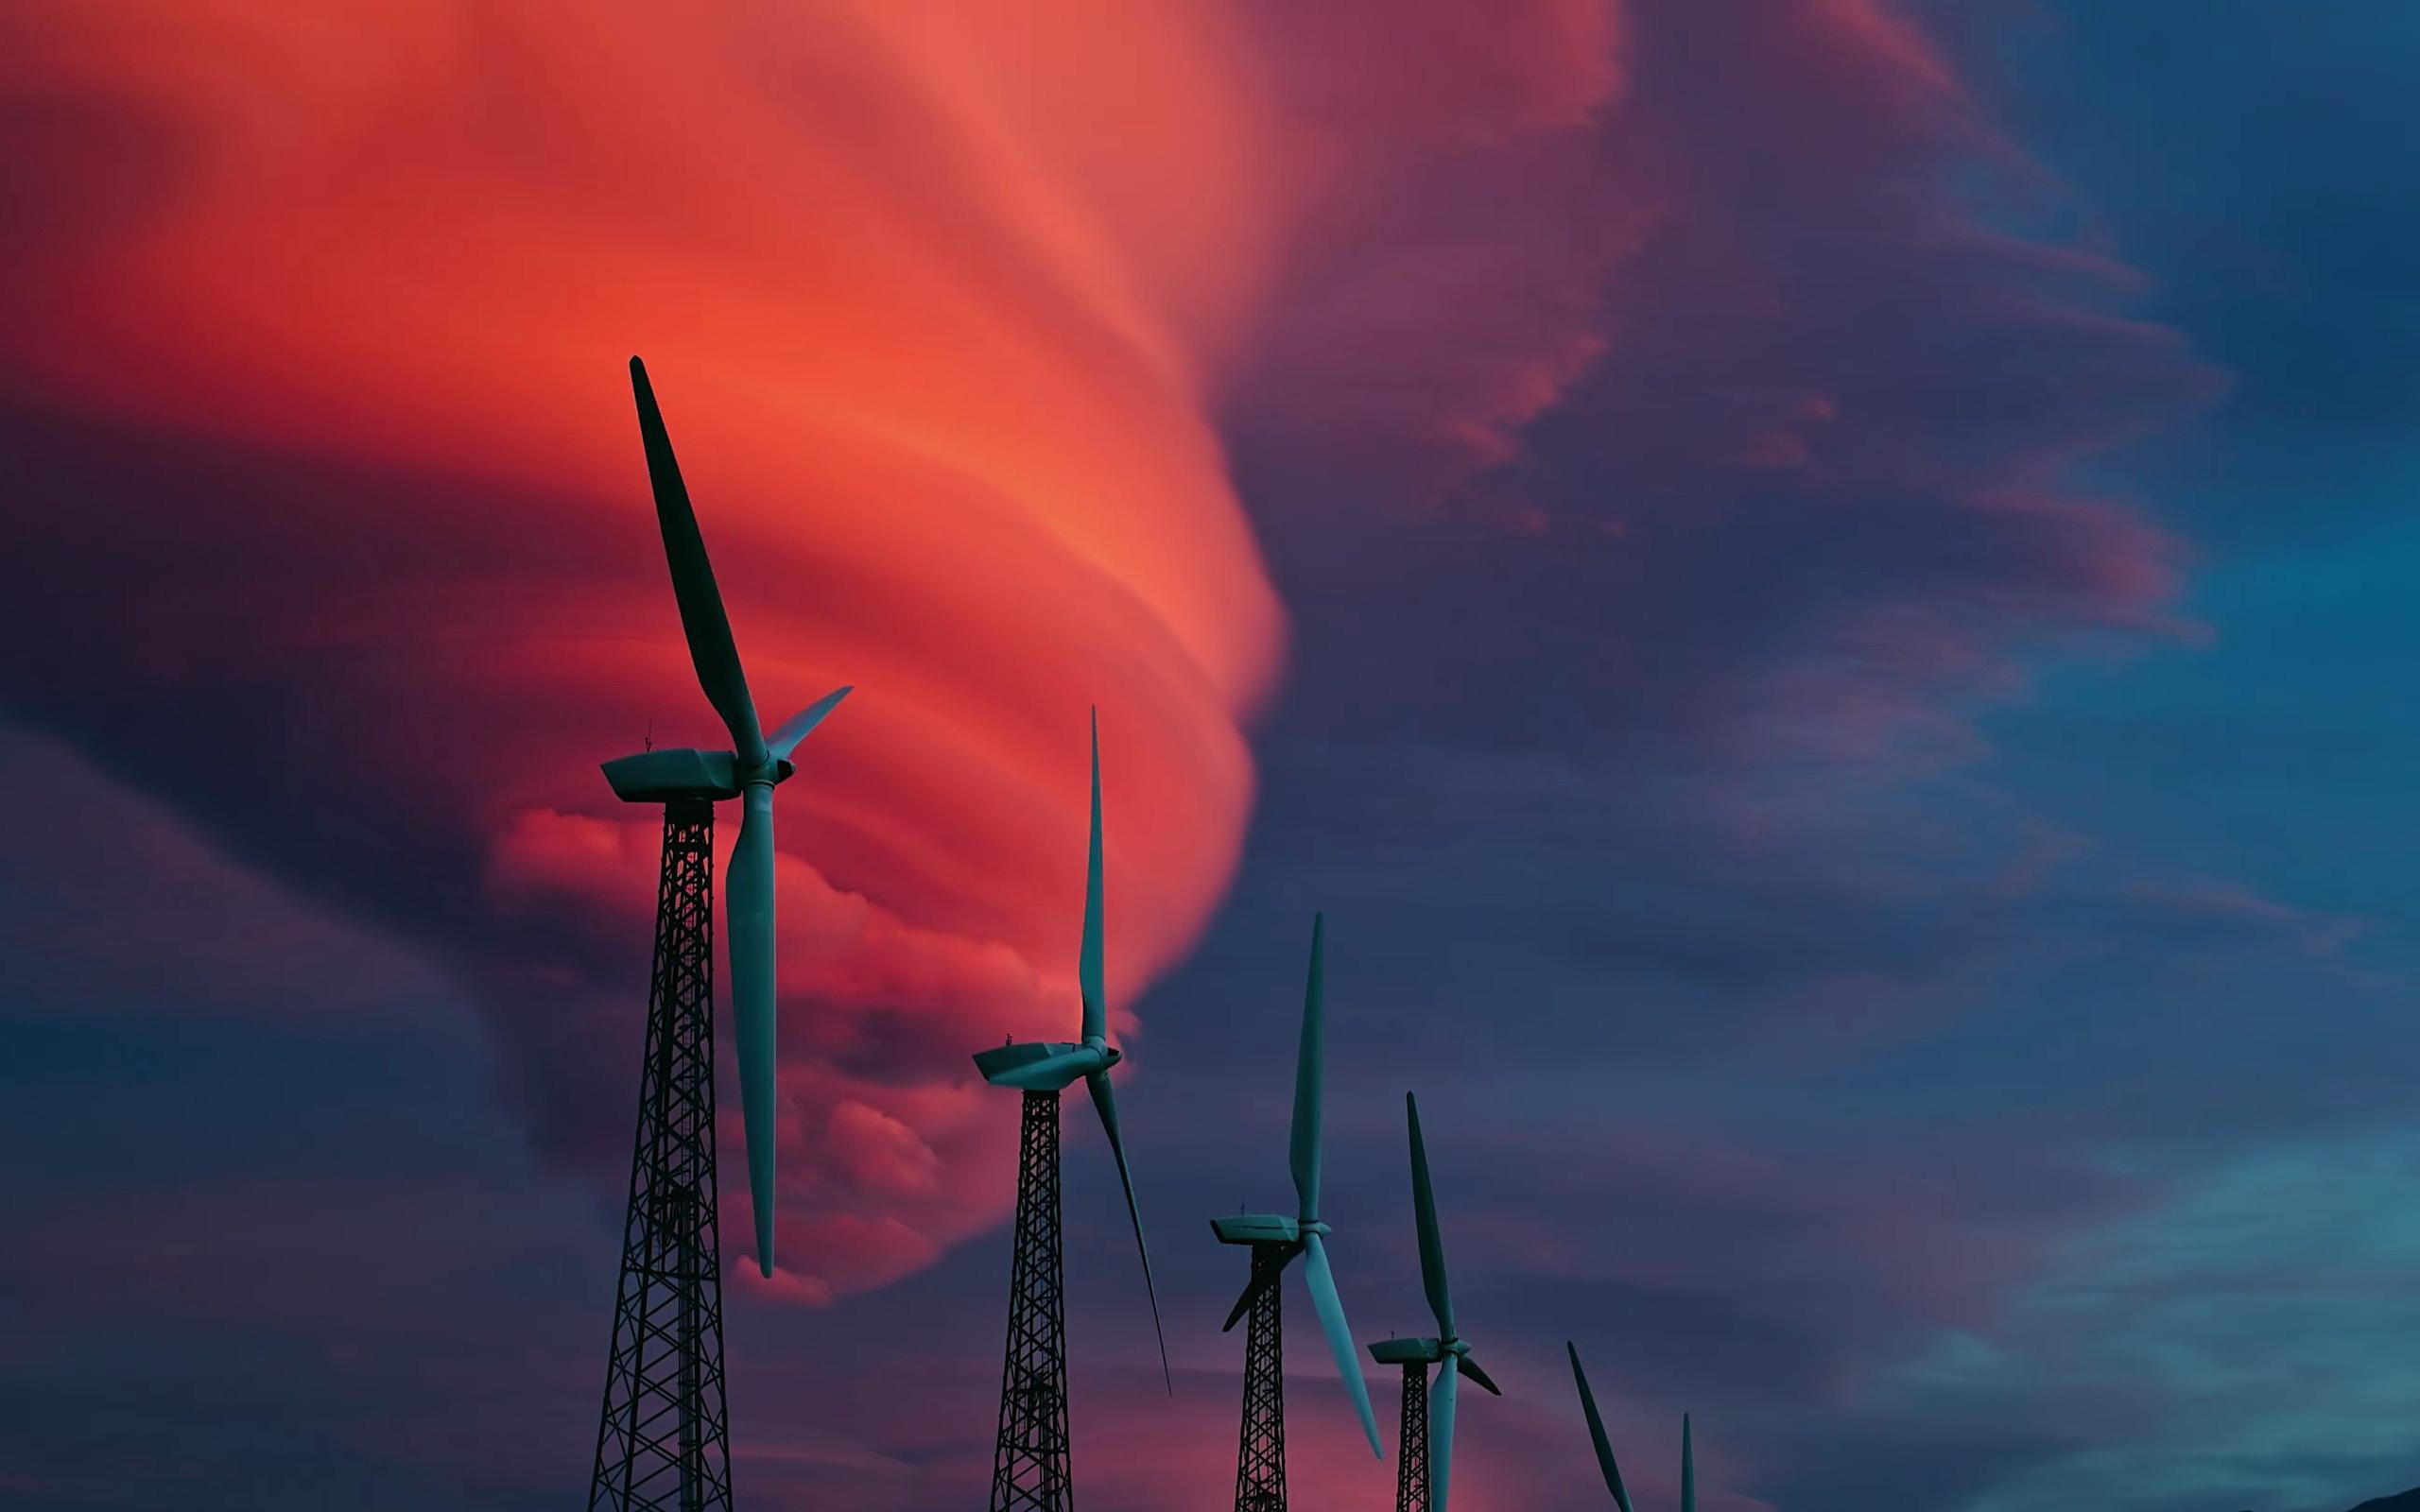 Free Wallpapers Wid Quotes Wind Turbine Computer Wallpapers Desktop Backgrounds